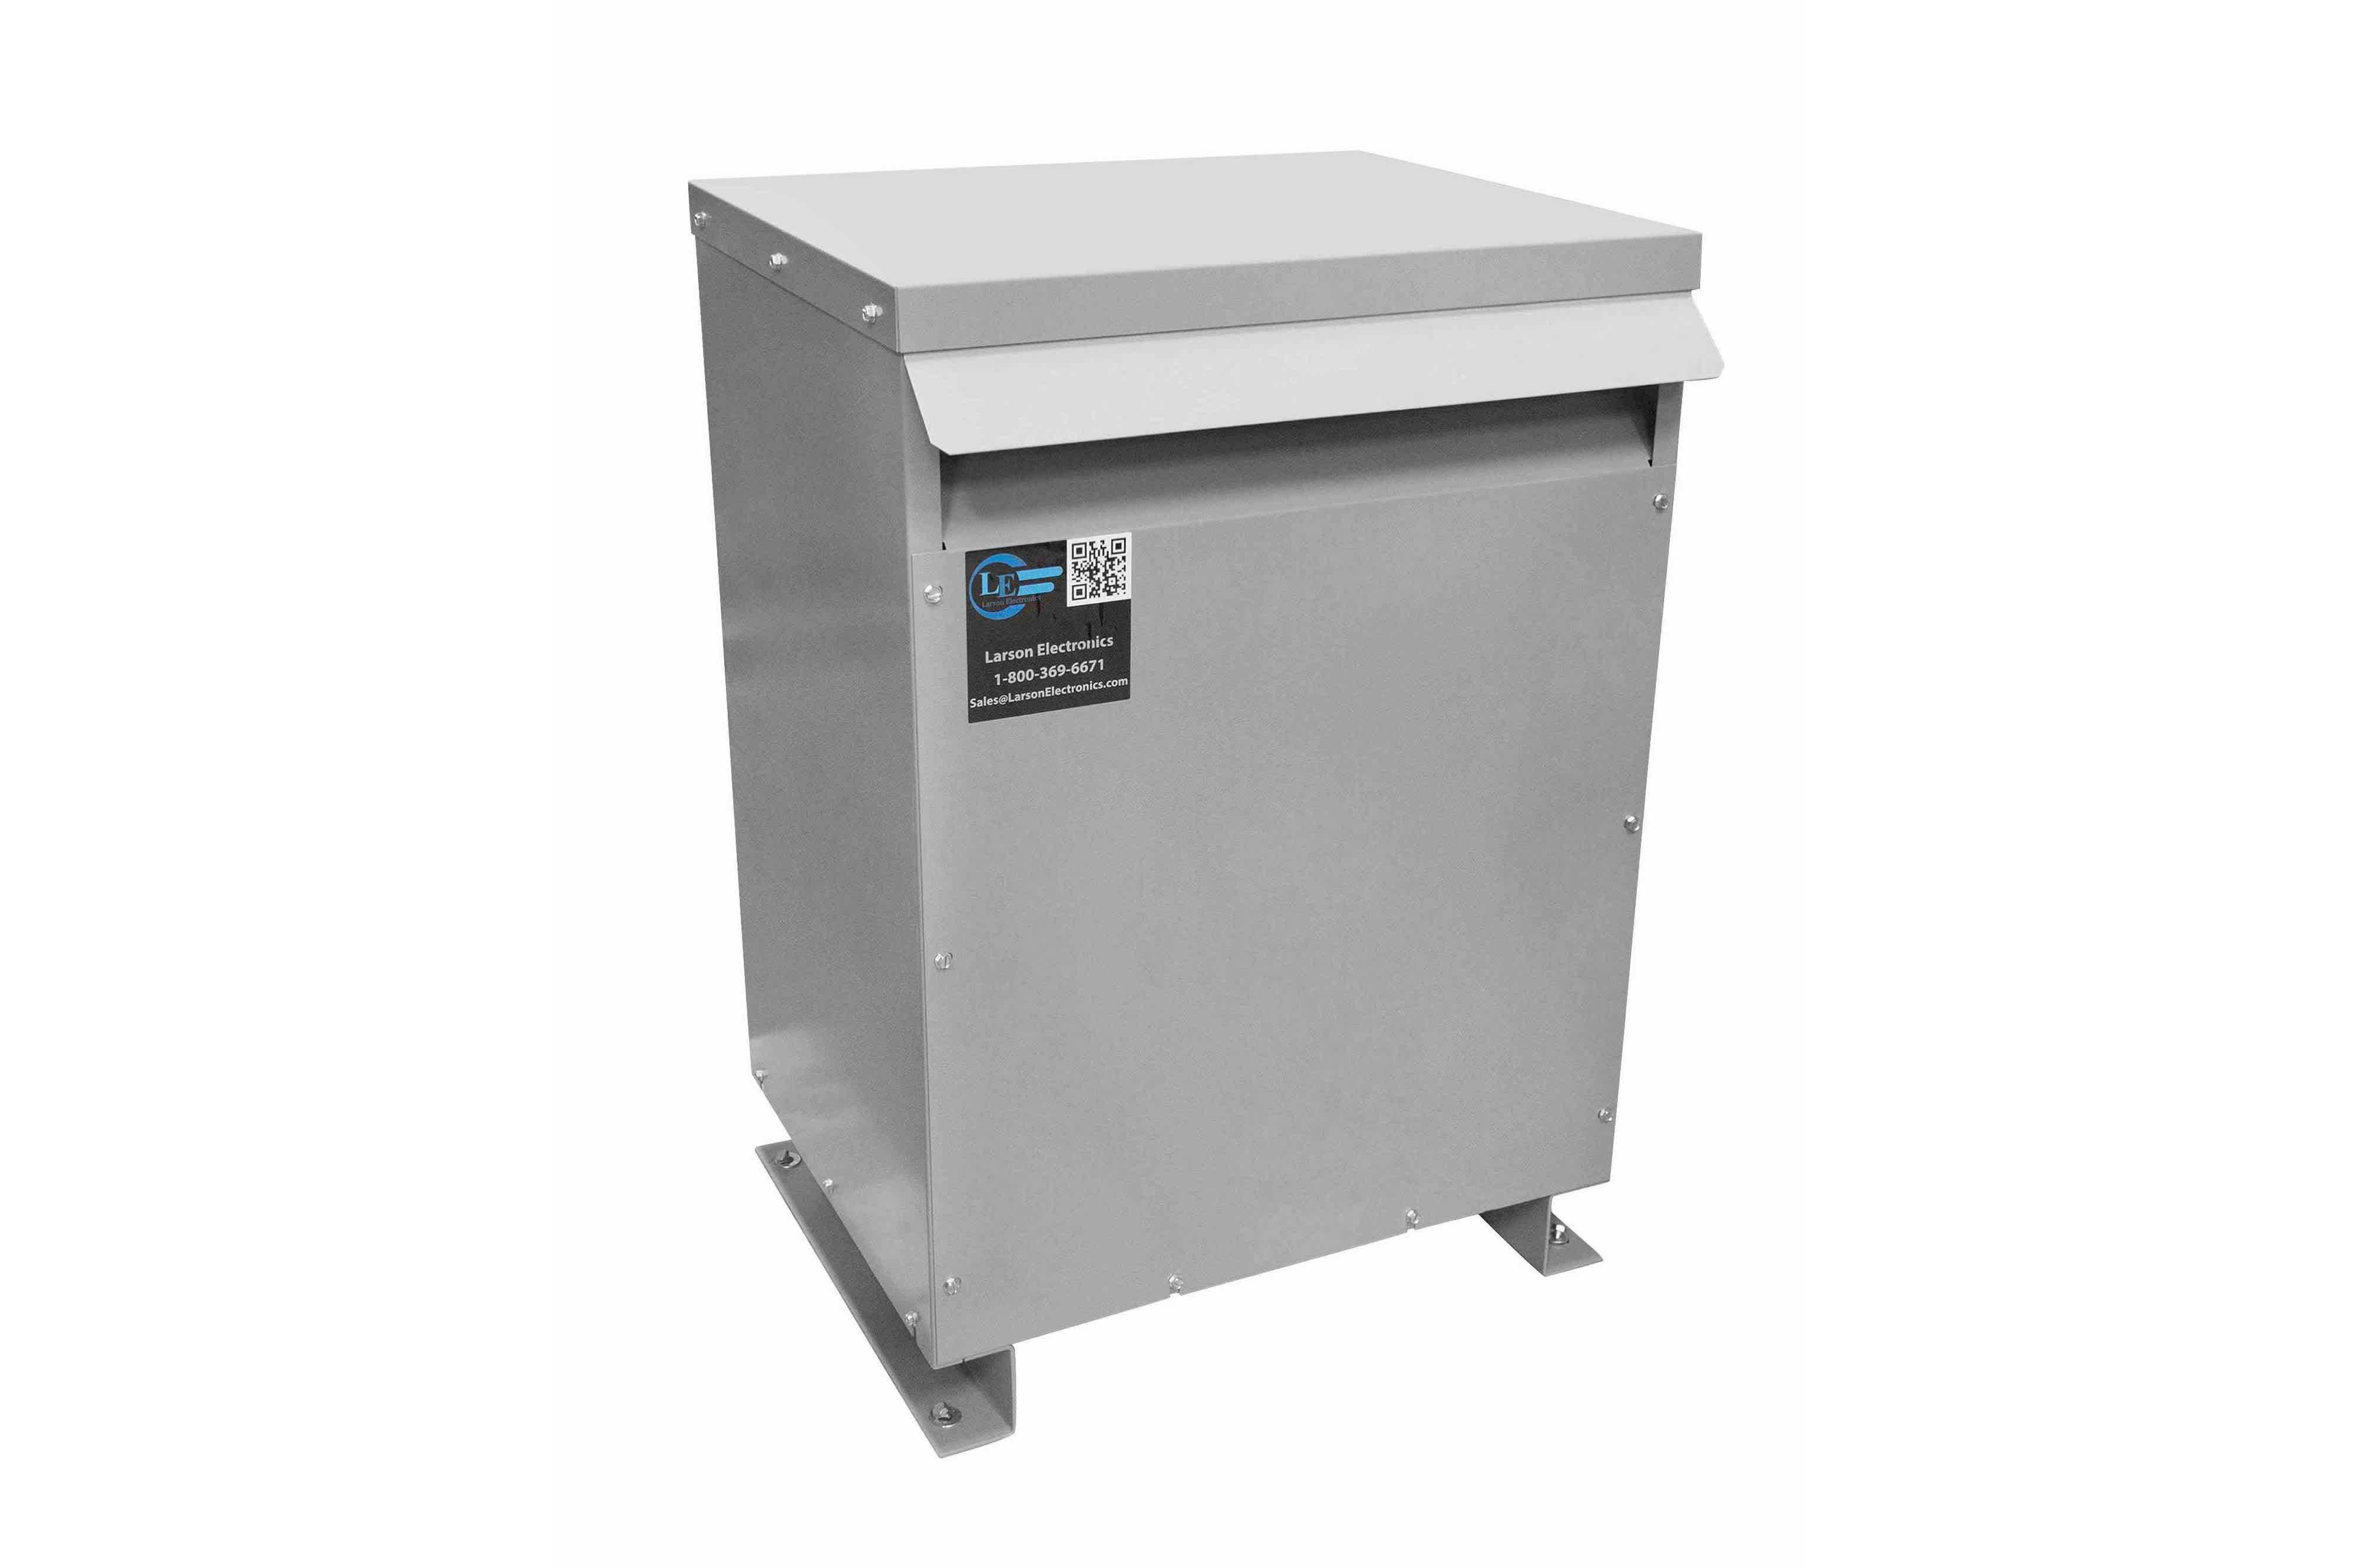 125 kVA 3PH Isolation Transformer, 380V Wye Primary, 208V Delta Secondary, N3R, Ventilated, 60 Hz